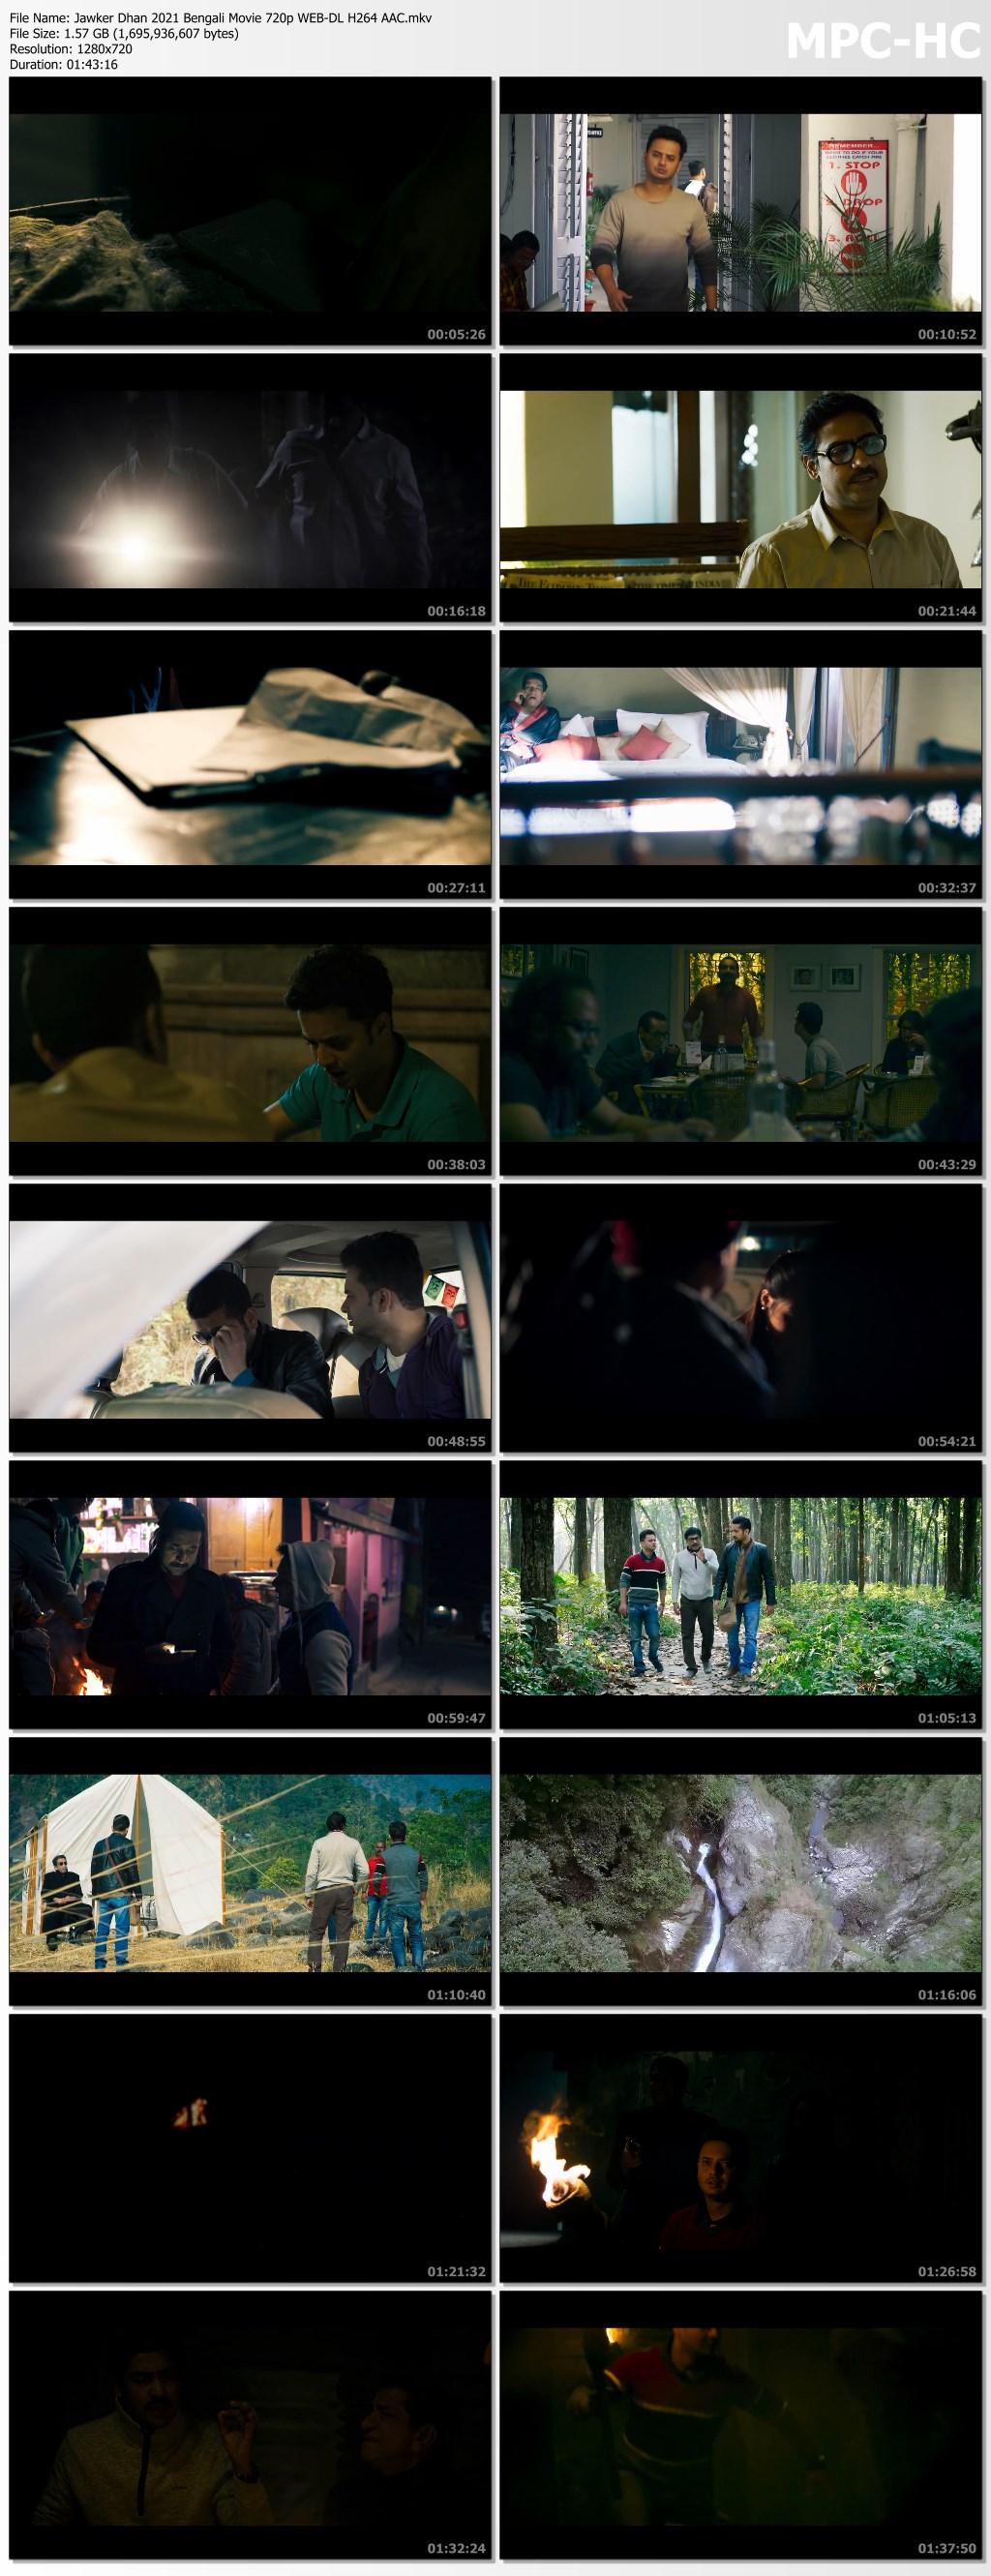 Jawker Dhan 2021 Bengali Movie 720p WEB DL H264 AAC.mkv thumbs